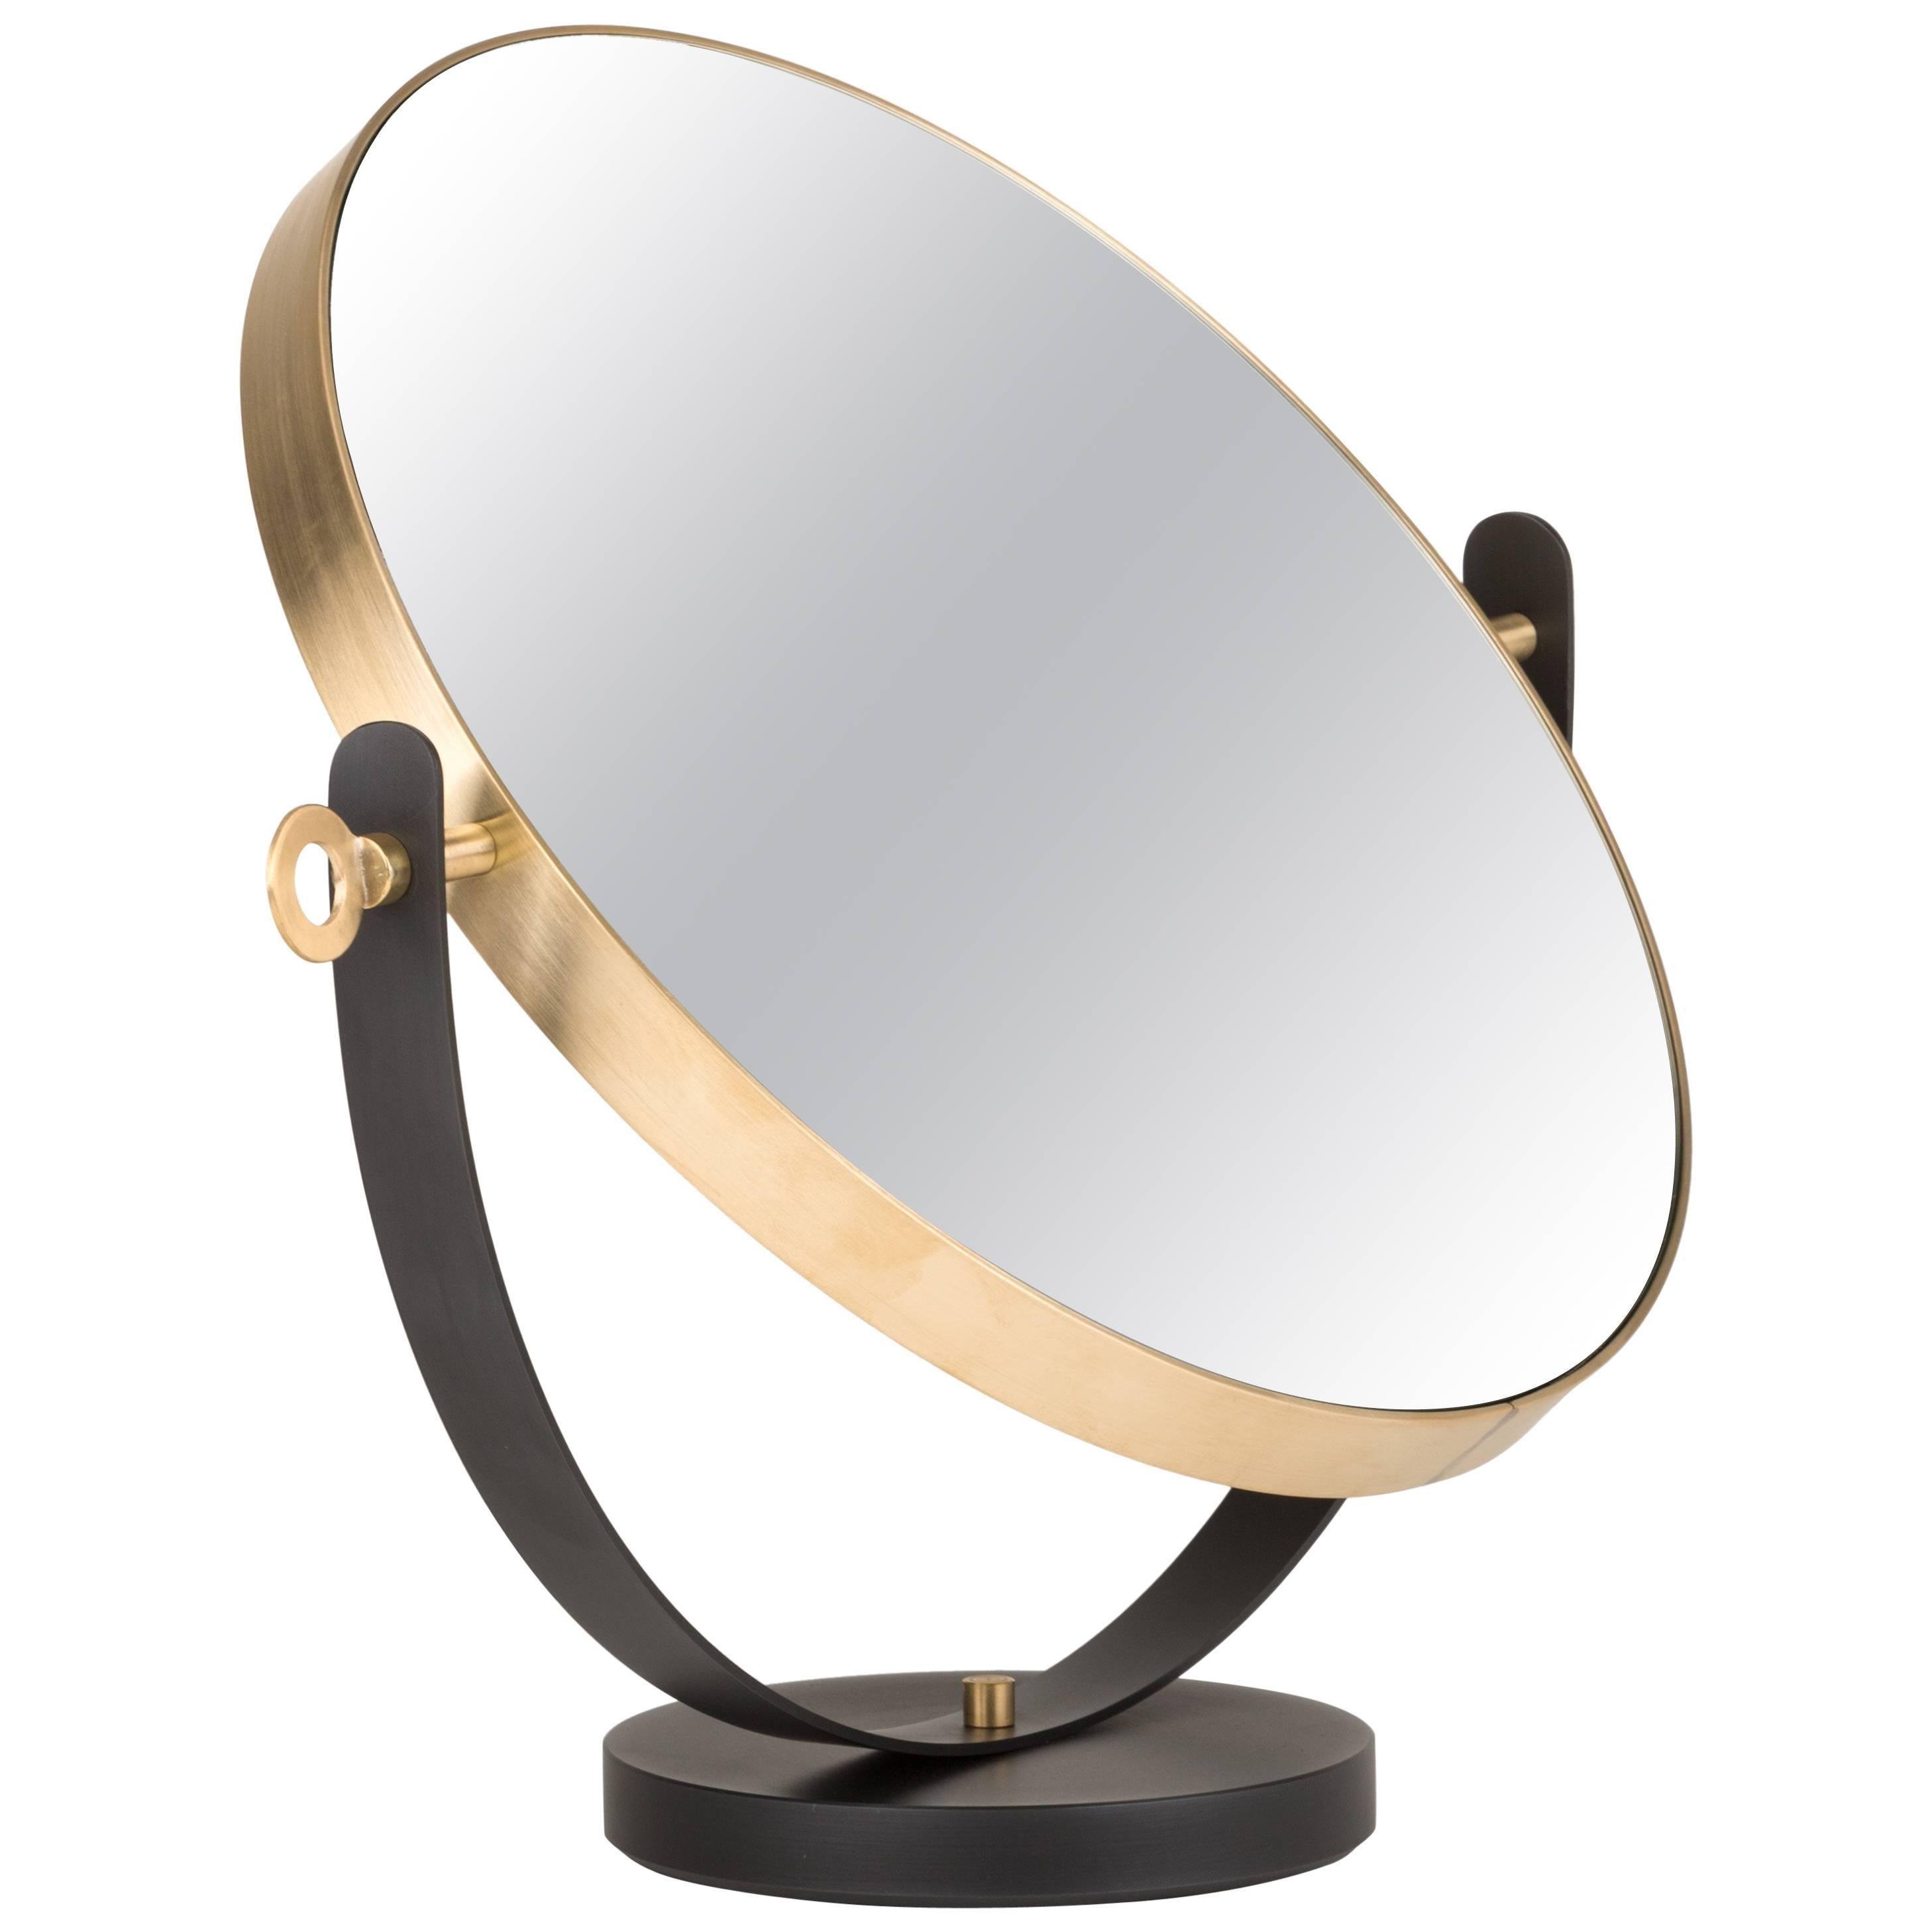 Ilario Brass Mirror Designed by Federica Biasi for Mingardo